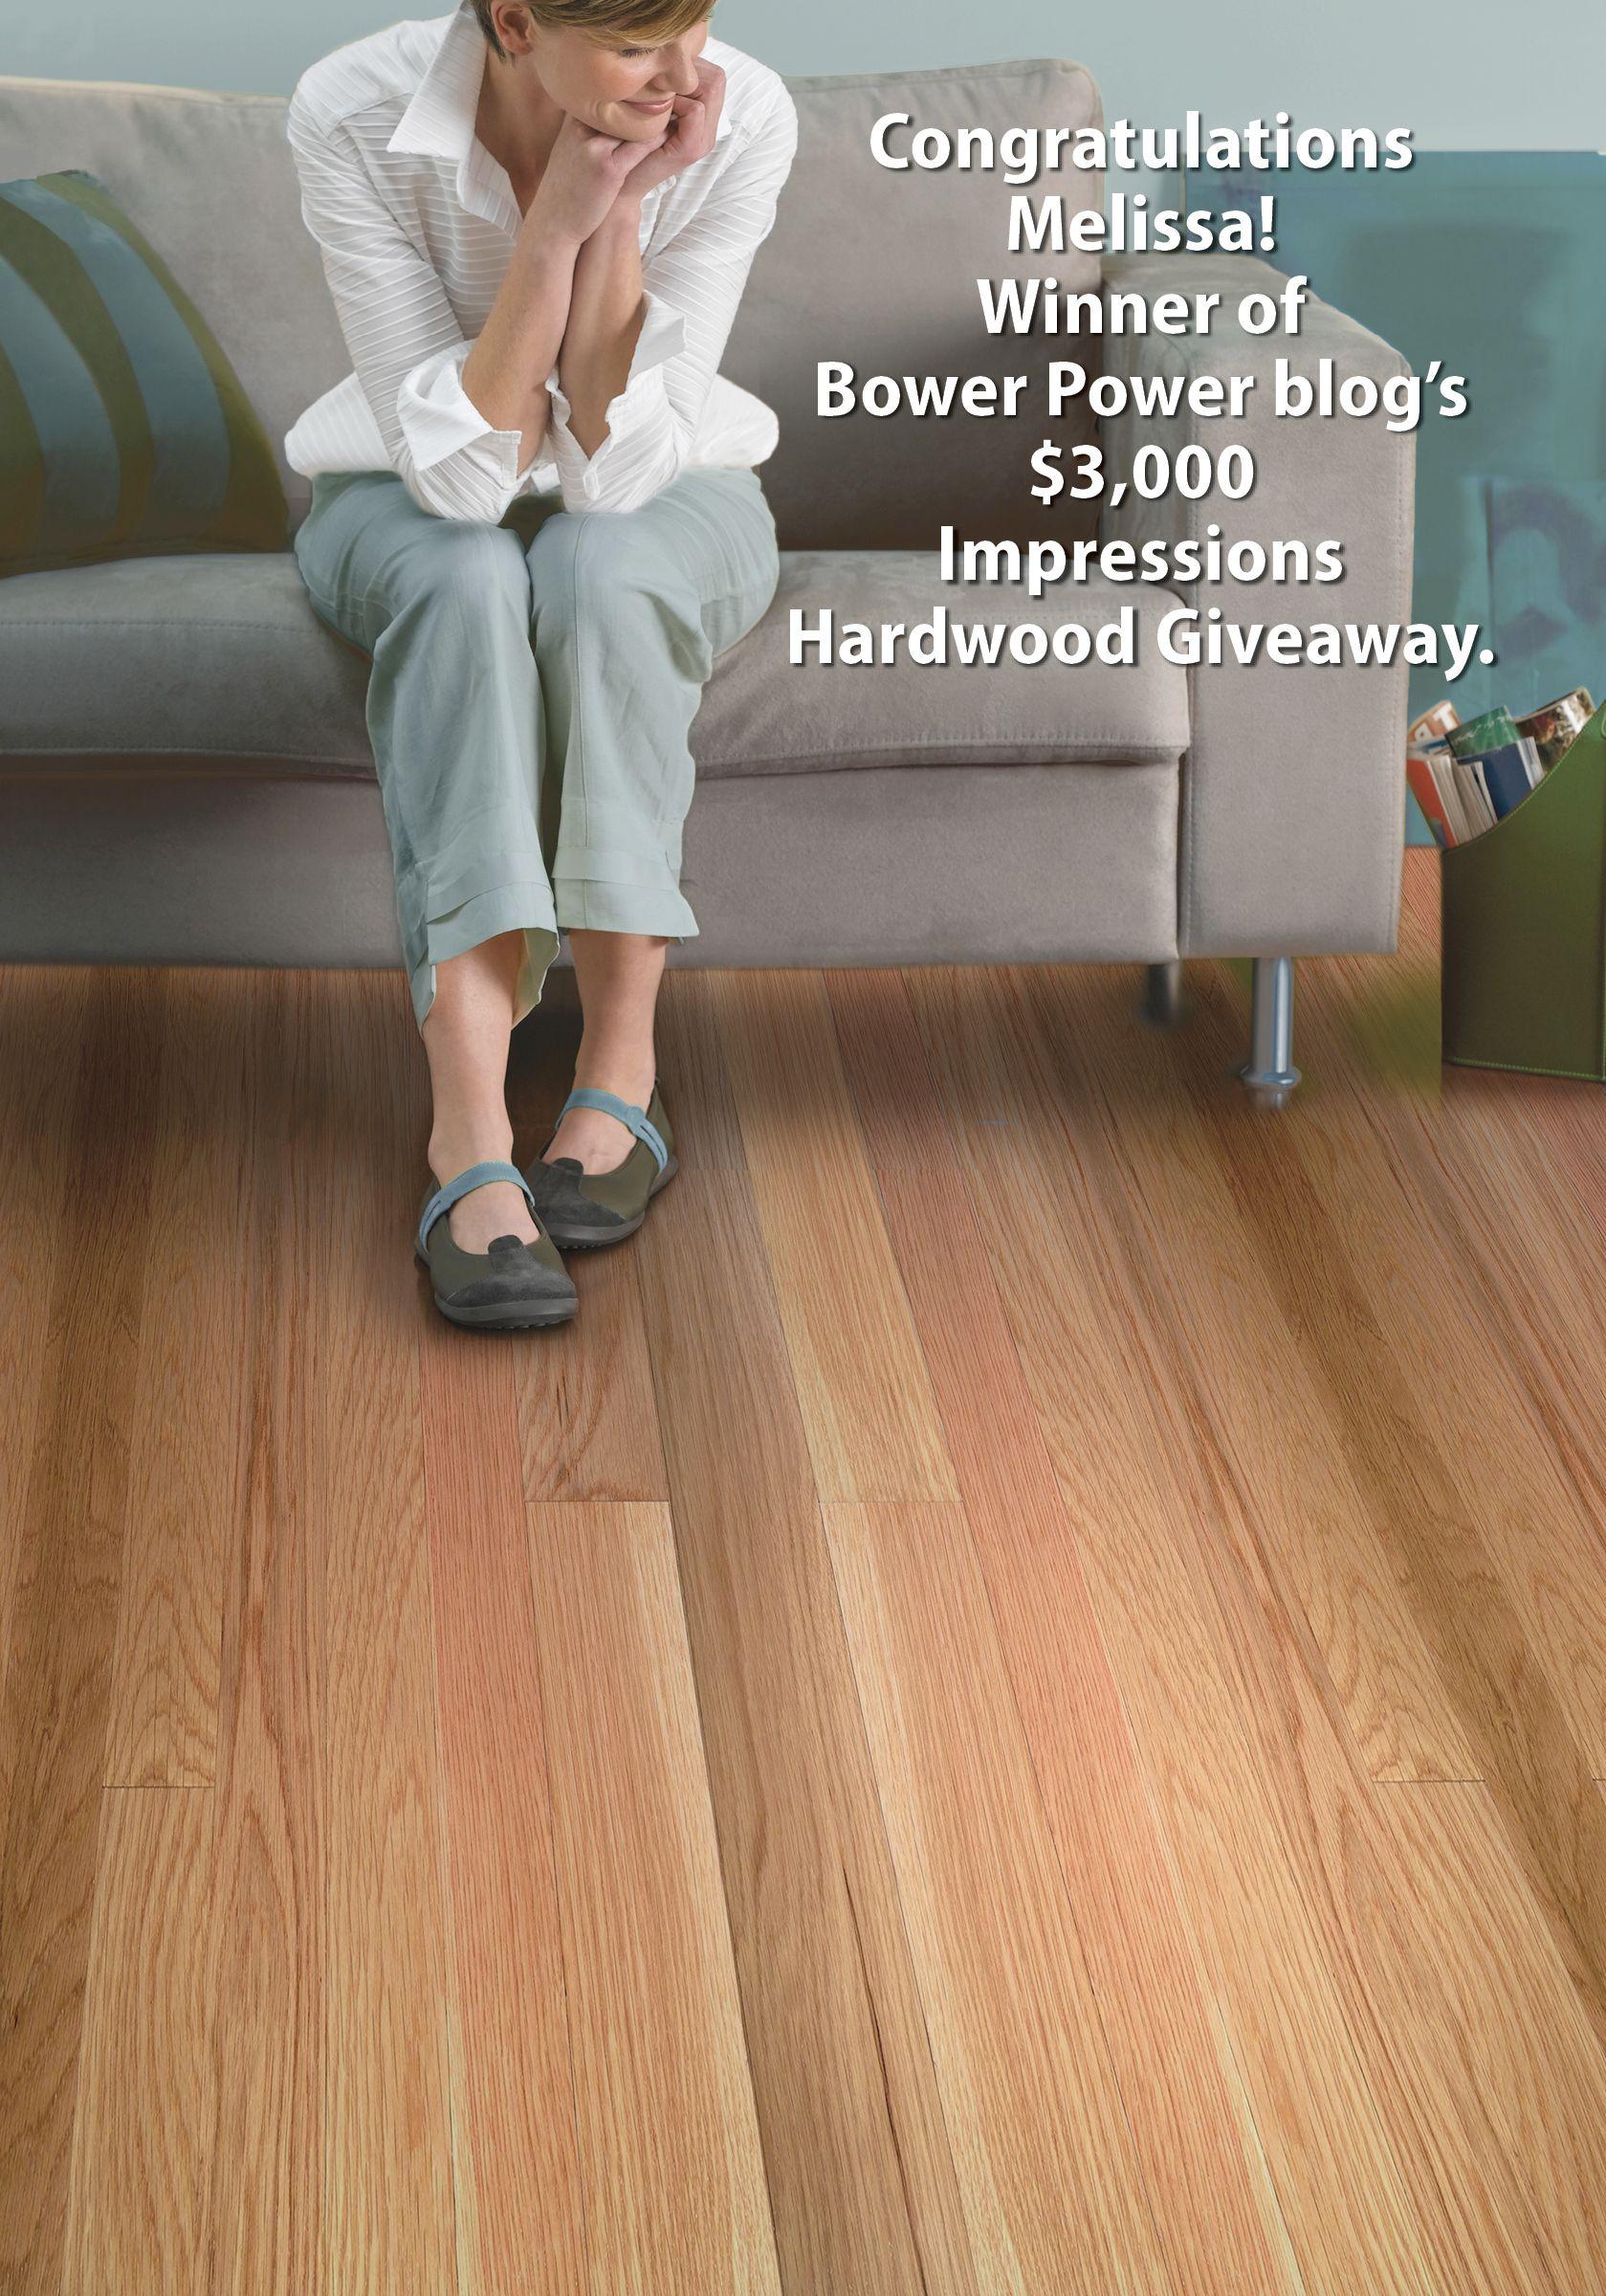 Impressions Hardwood Collections Hardwood Flooring Company Flooring Flooring Hardwood Floors Hardwood